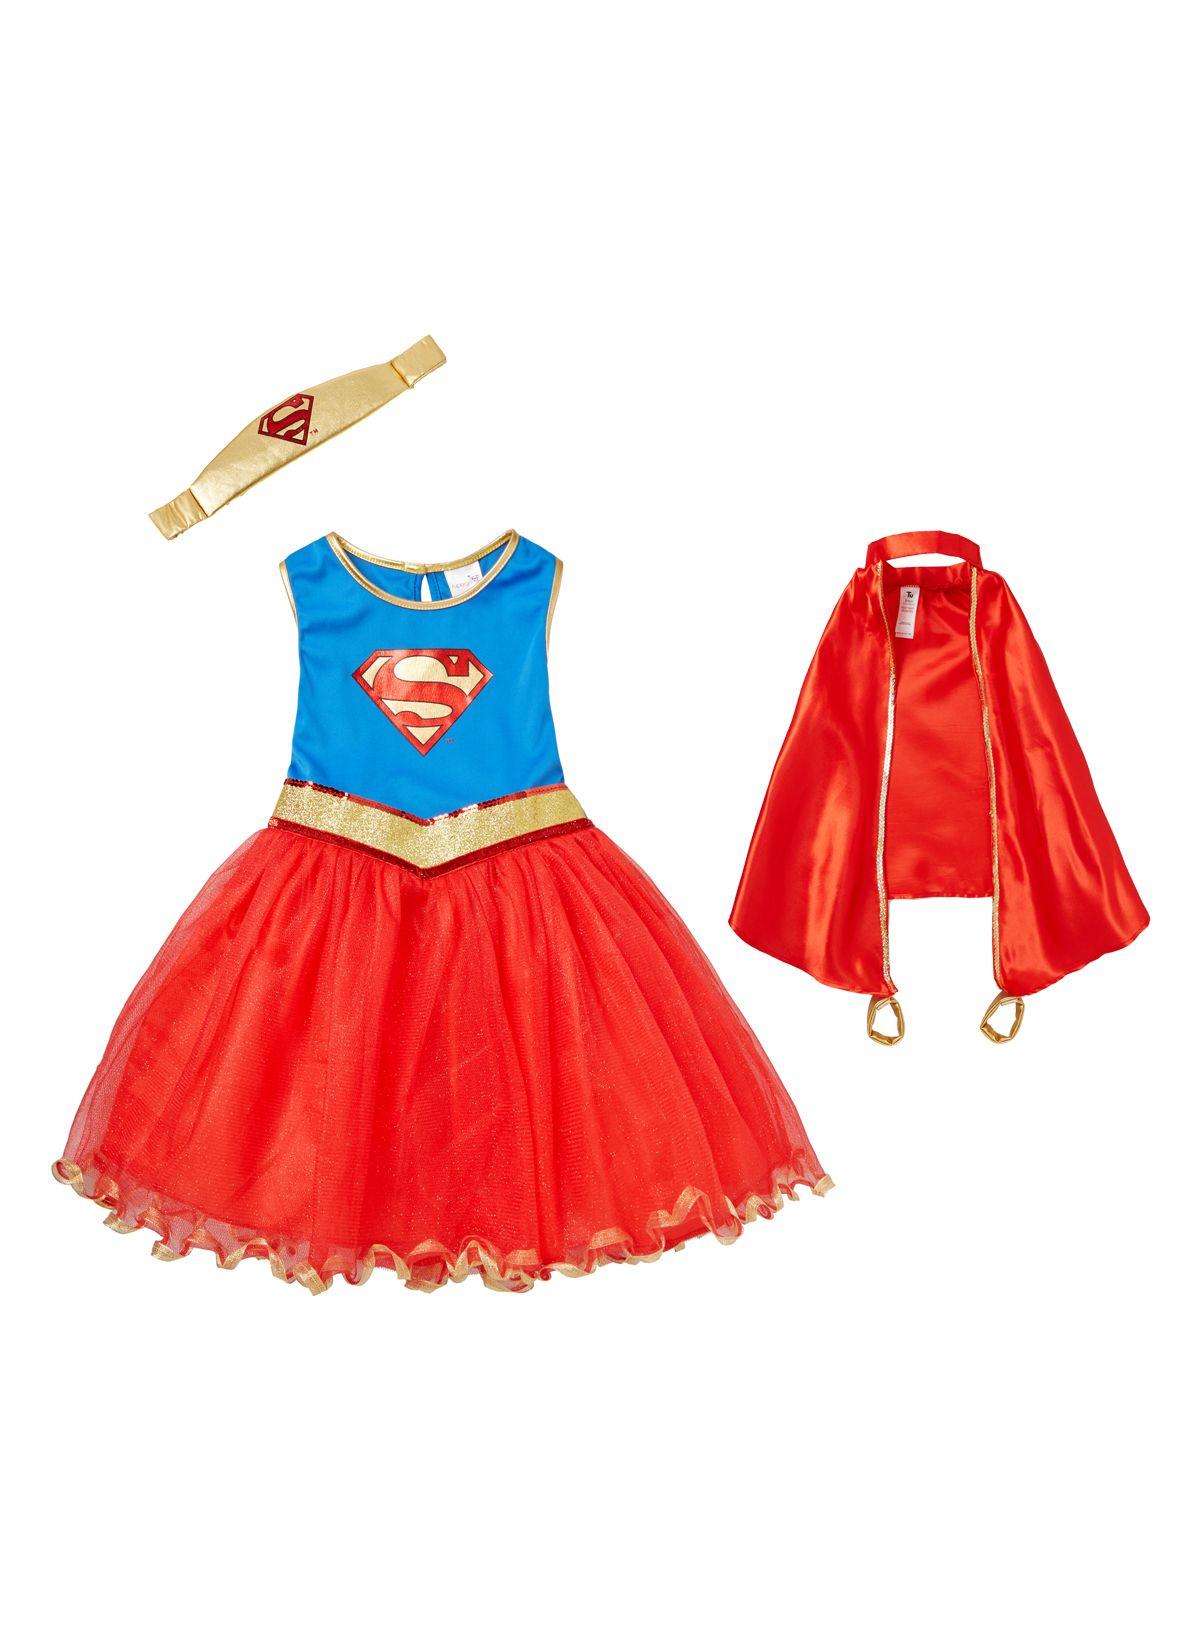 White apron sainsburys - 3 12 Years Tu At Sainsburys Girls Red Supergirl Outfit 15